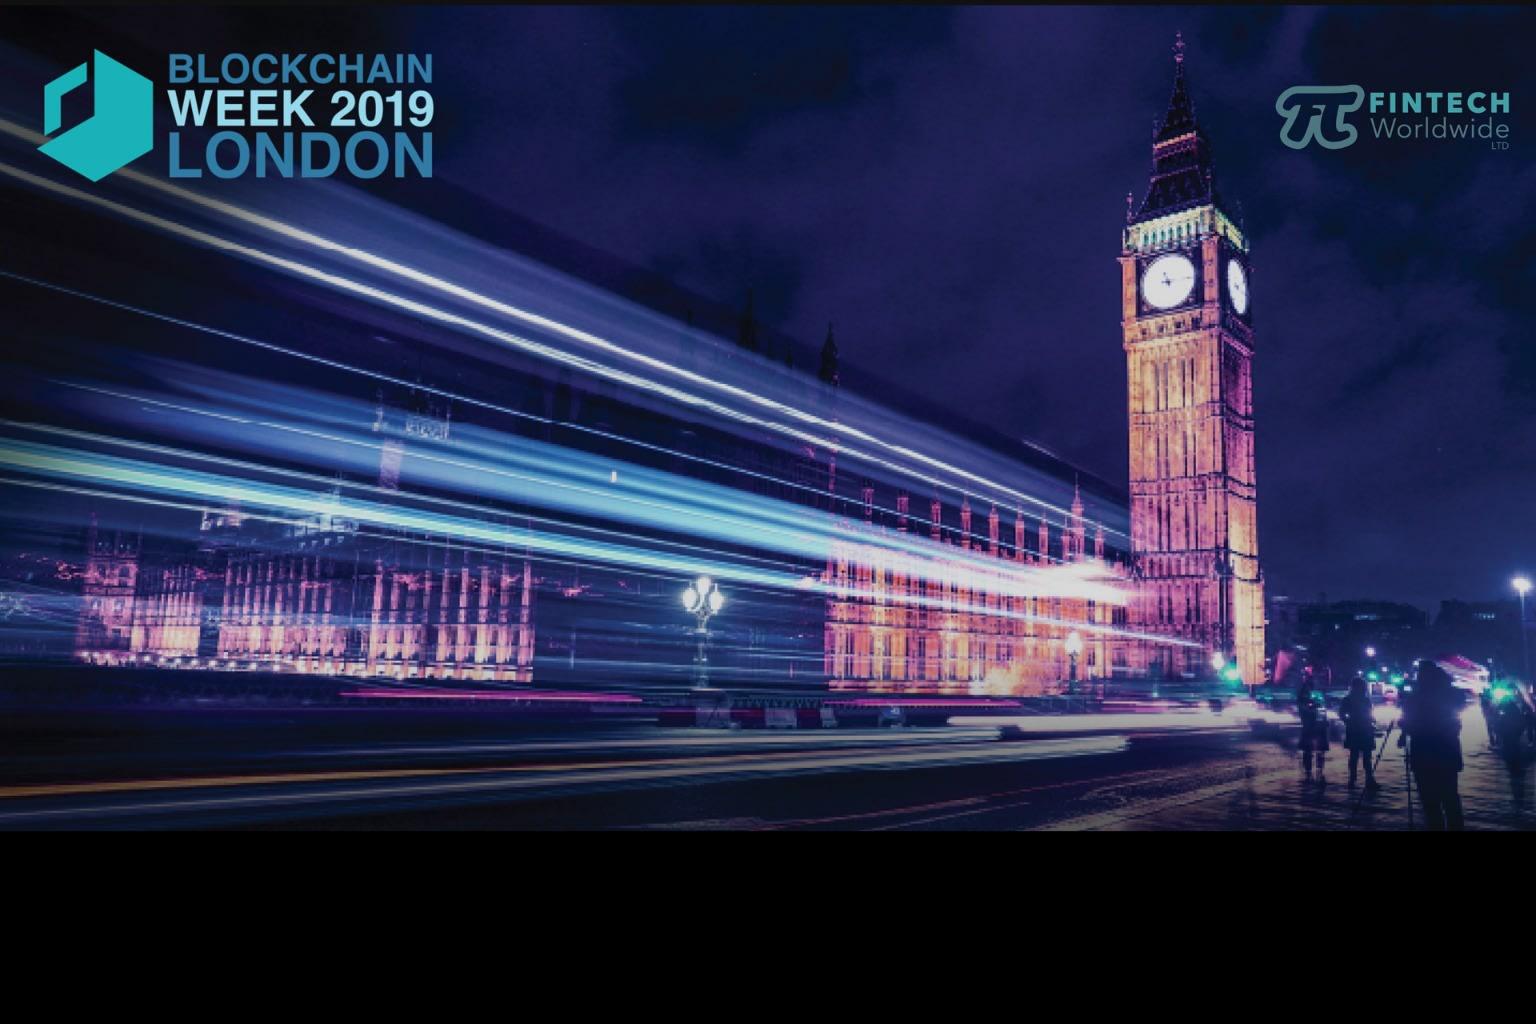 london-blockchain-week